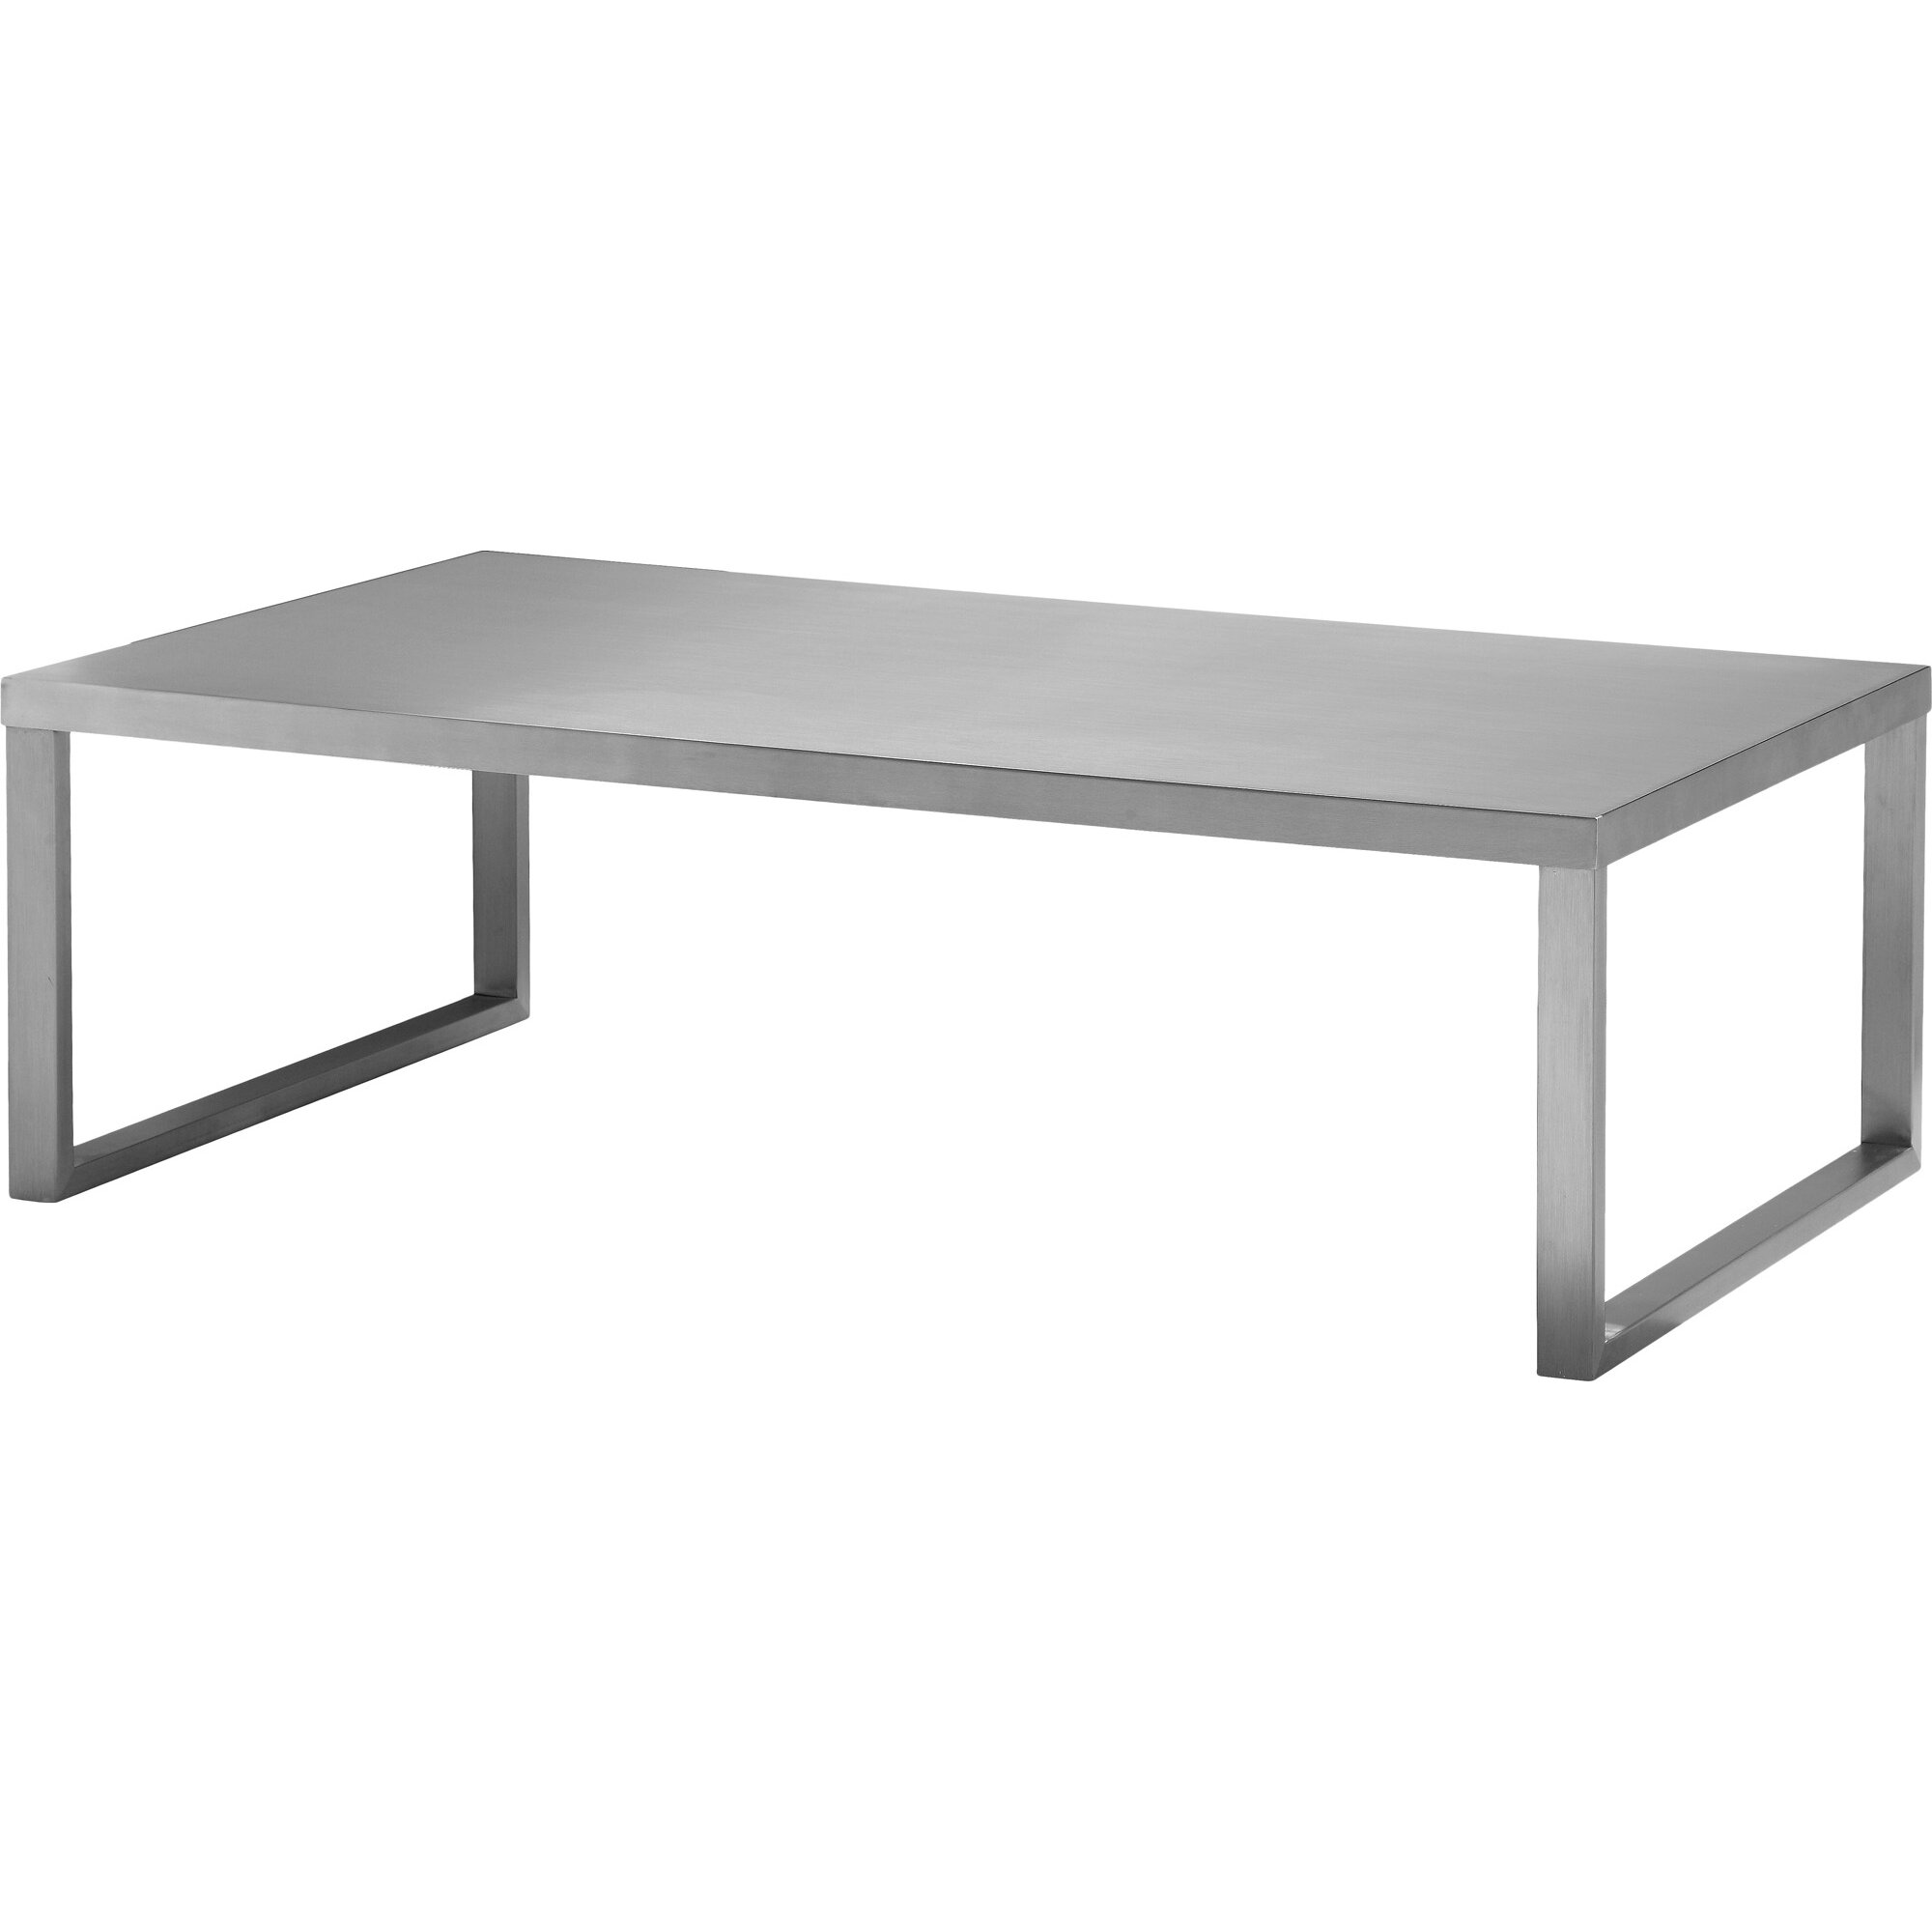 Airplane Wing Coffee Table Pangea Home Century Coffee Table Reviews Wayfair